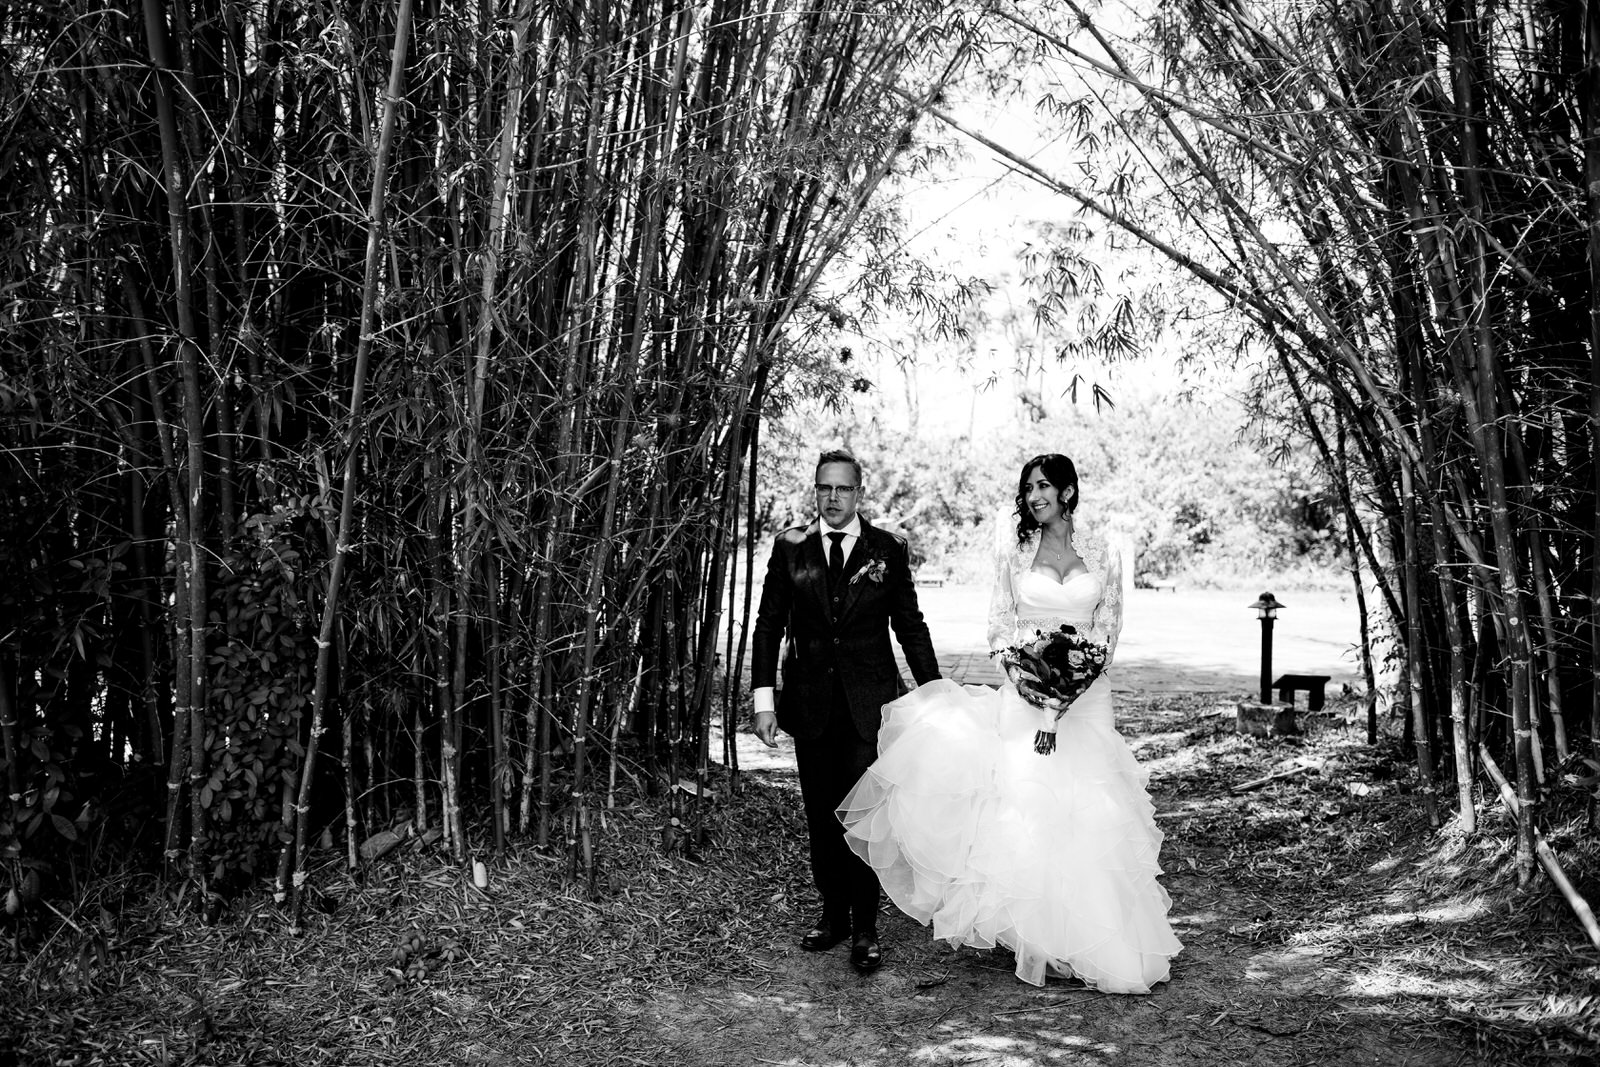 kashi-ashram-wedding-bride-and-groom-portraits-tiny-house-photo.jpg